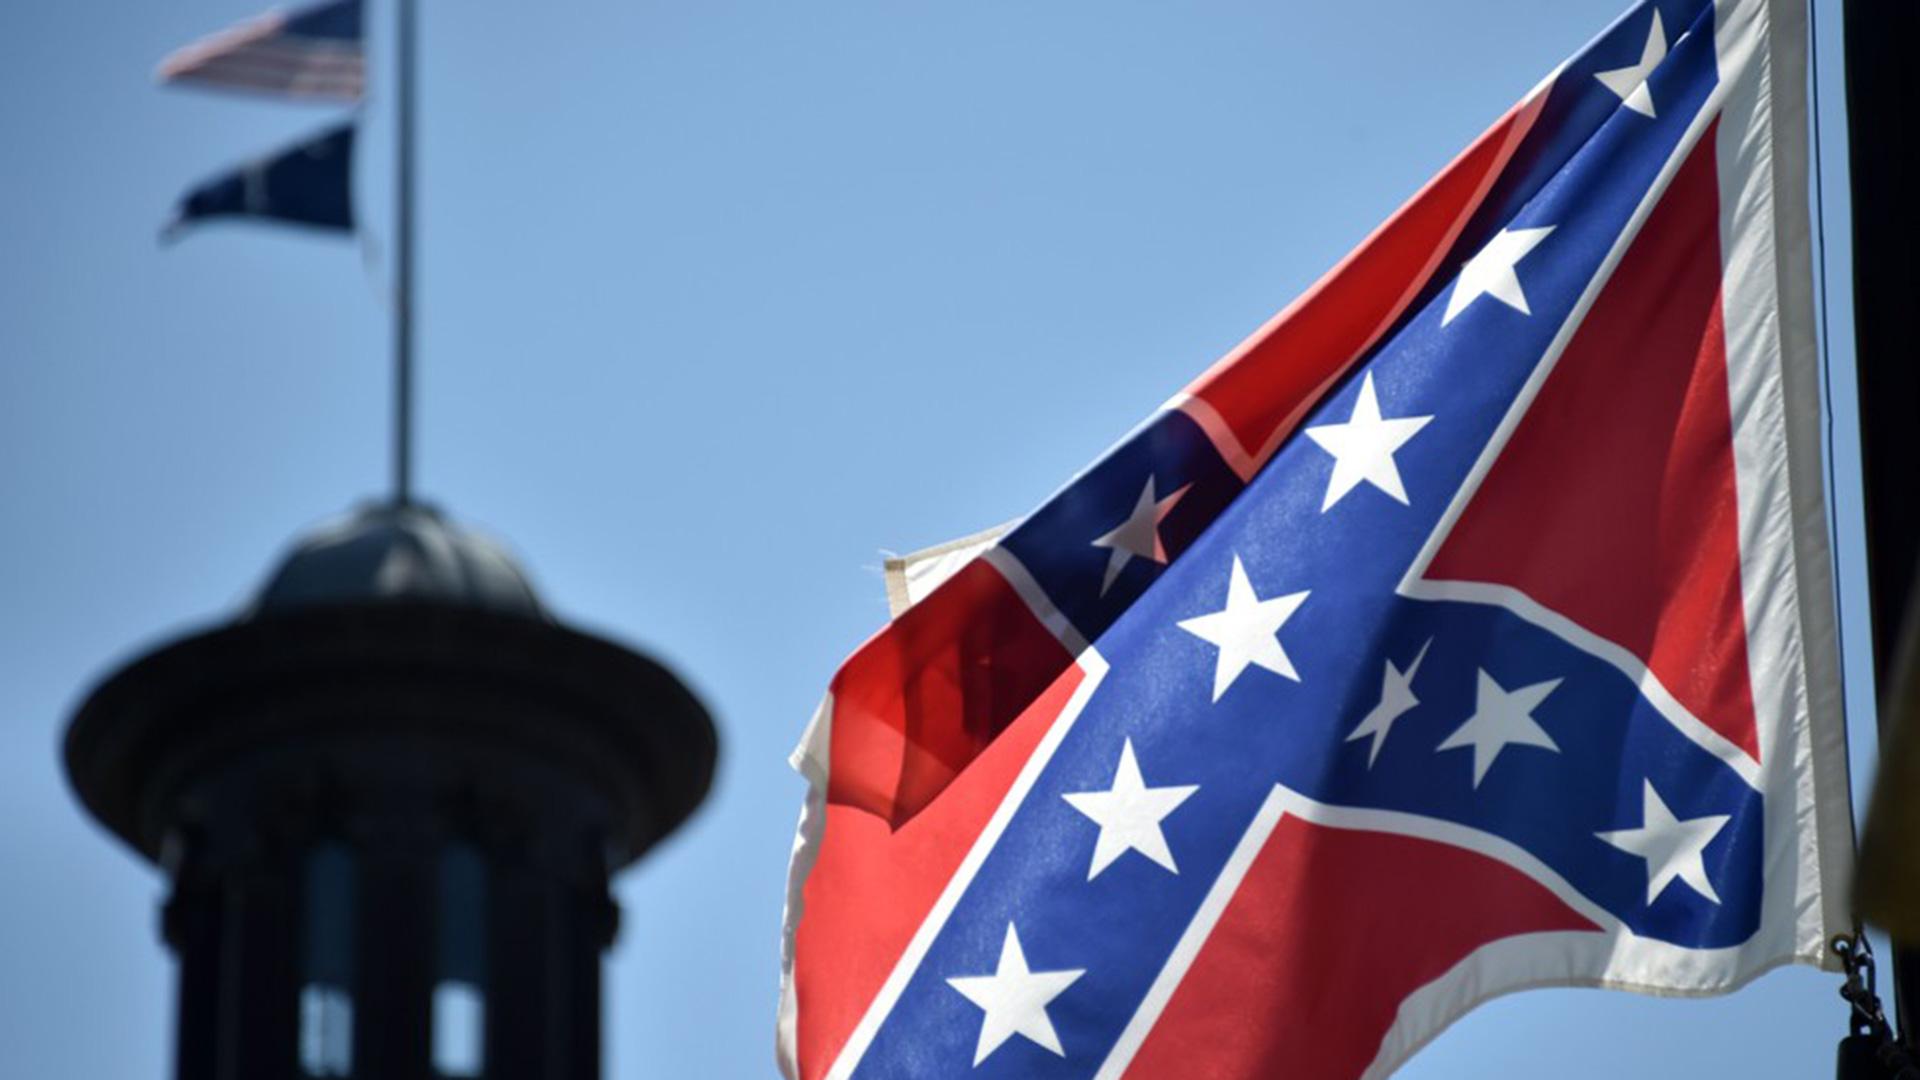 Church killings ignite furor anew over S.C. Capitol's Confederate flag